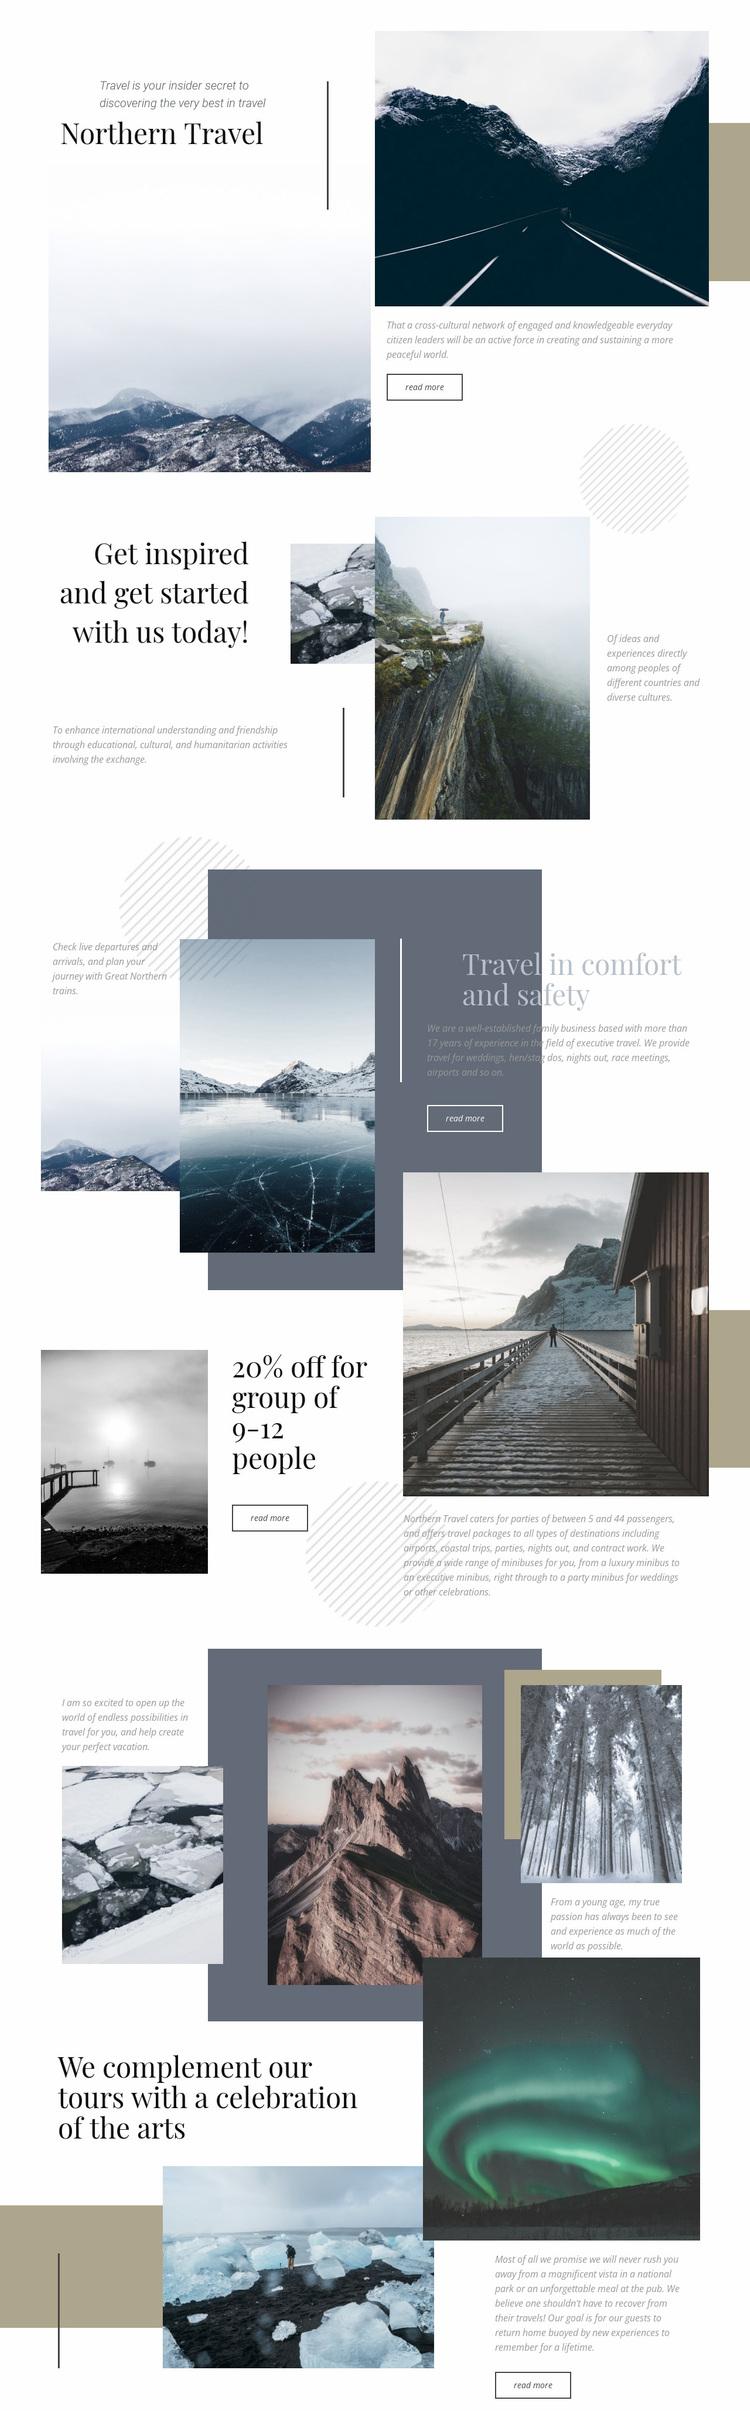 Northern Travel Website Design